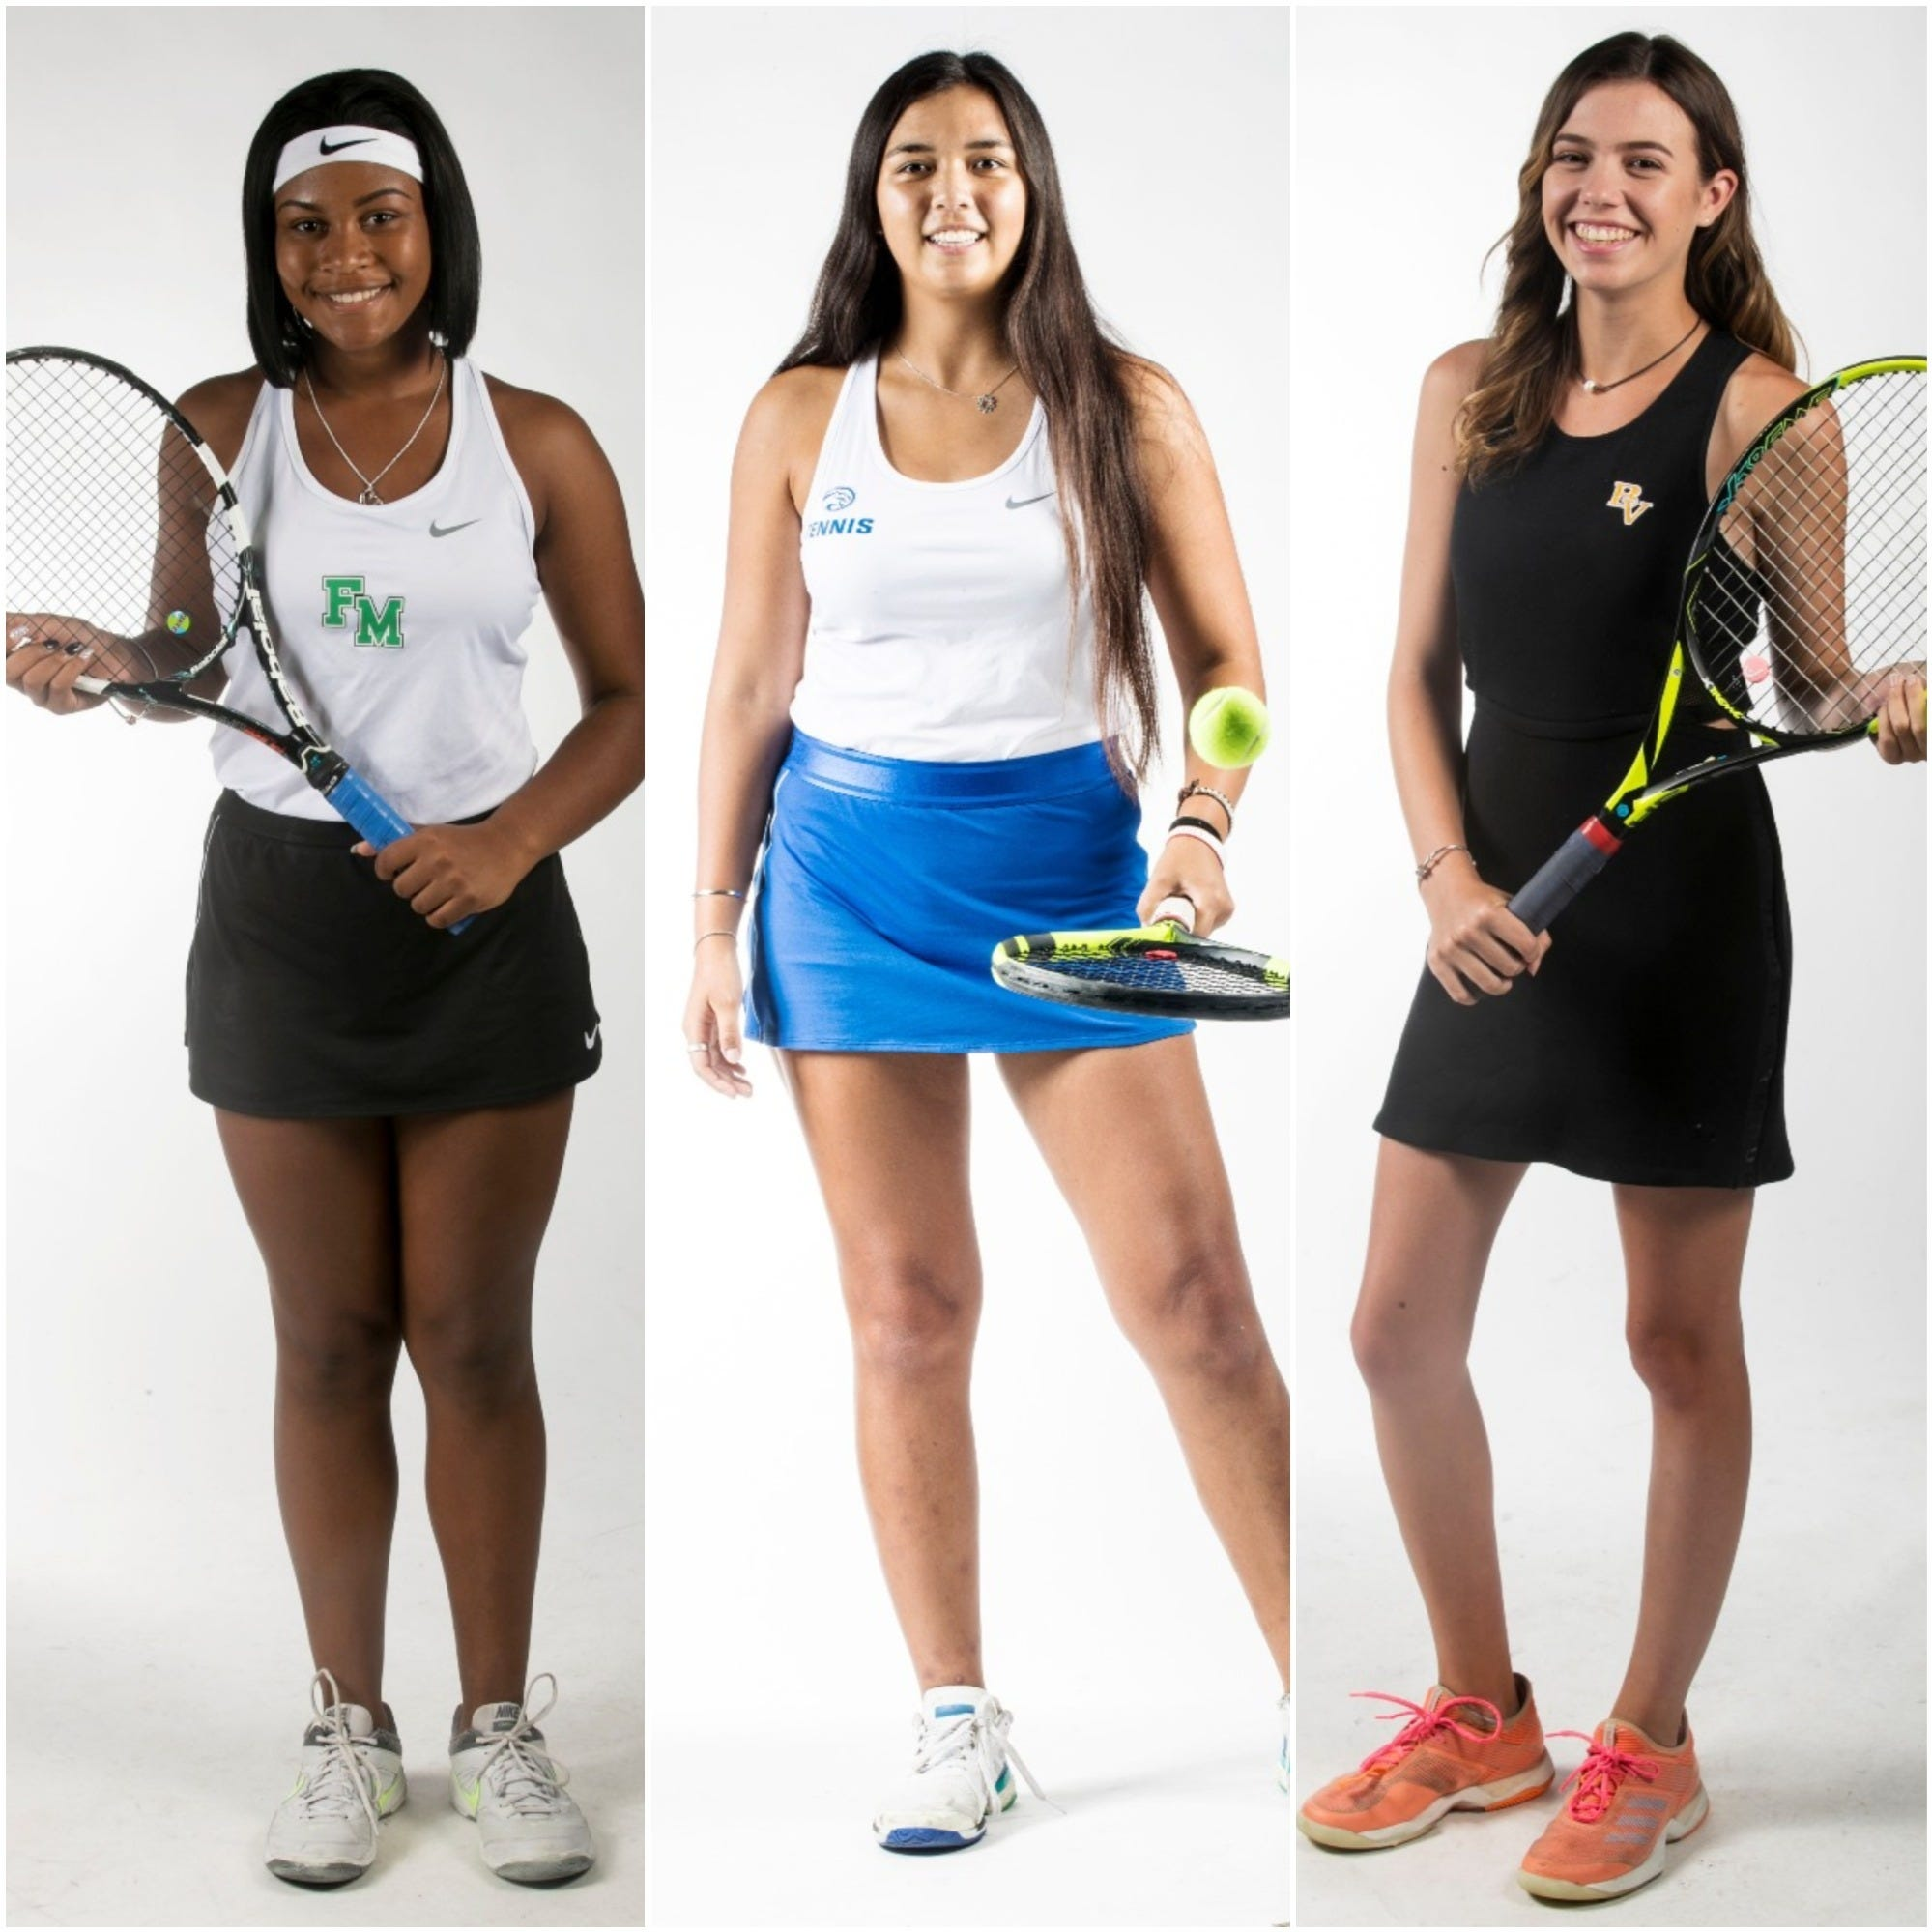 The News-Press 2019 All-Area Girls Tennis team